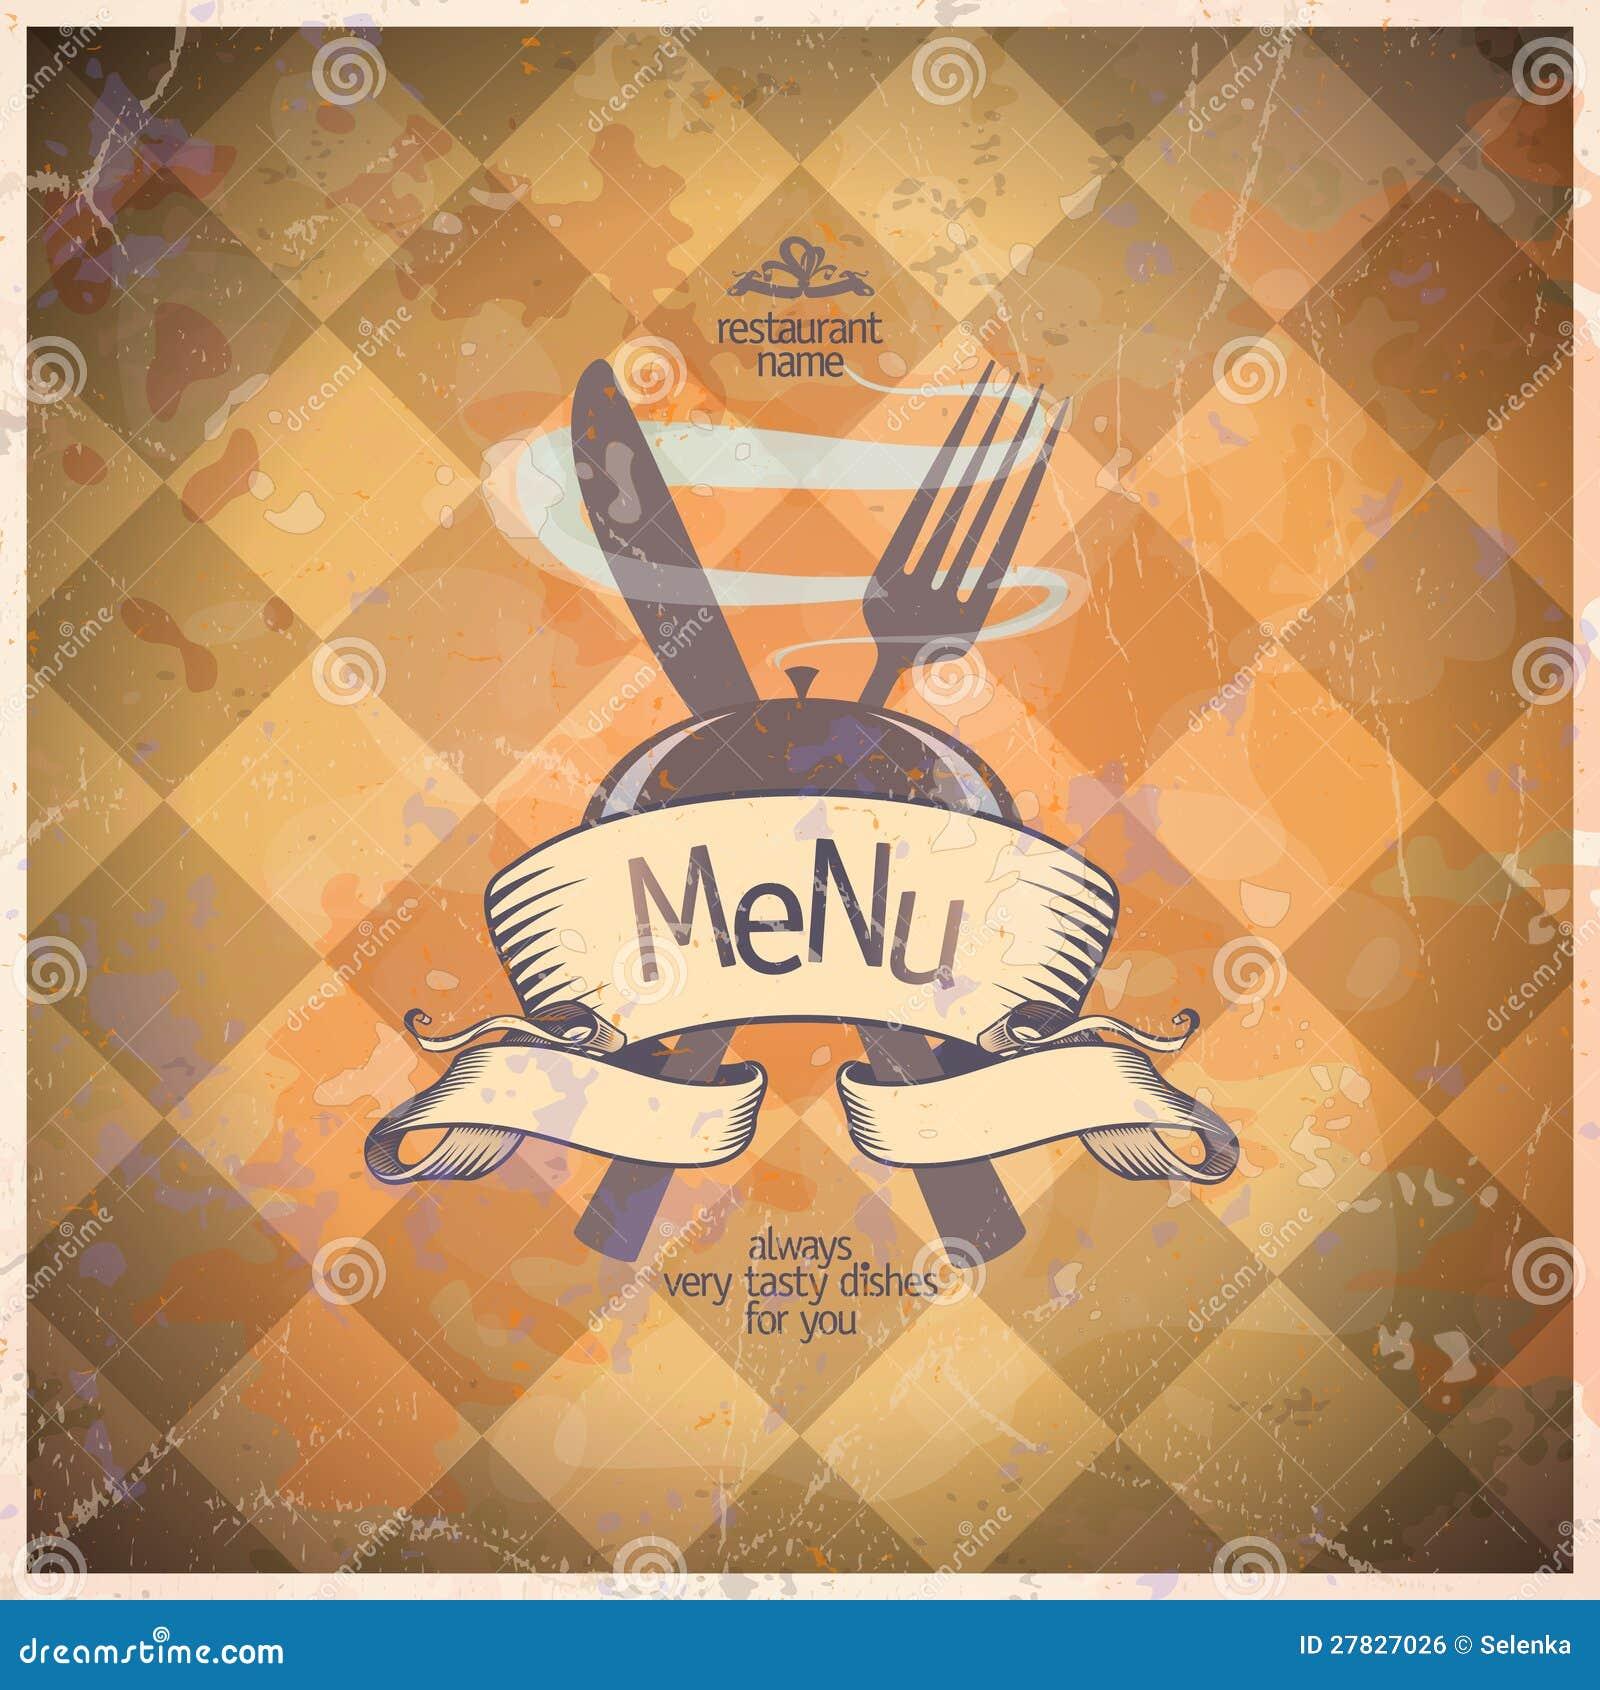 retro restaurant menu card design  royalty free stock